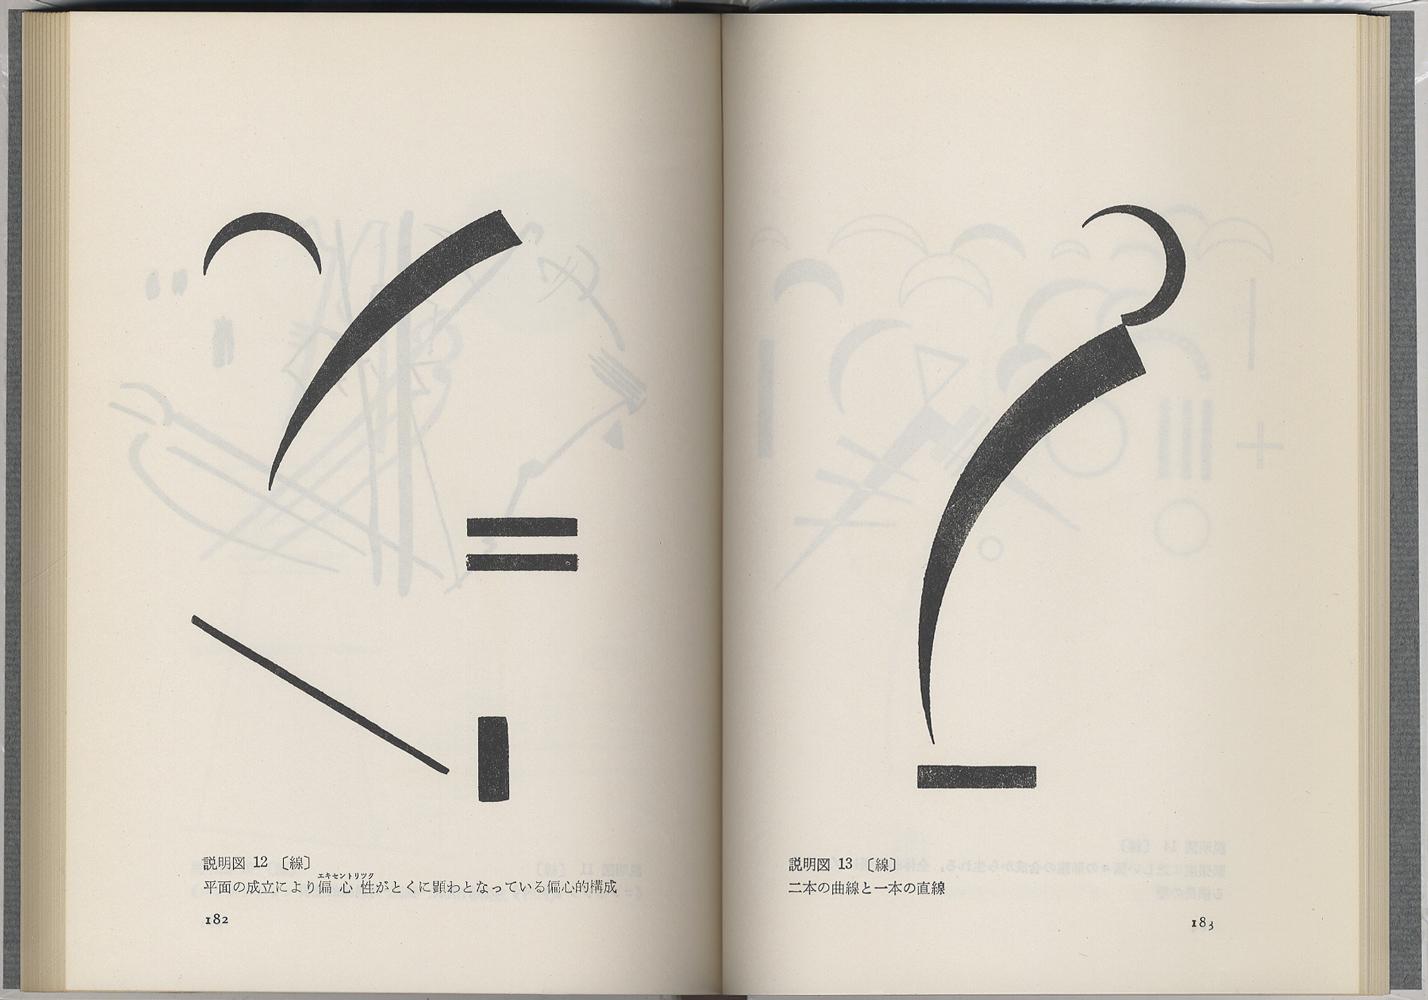 点・線・面 抽象芸術の基礎[image5]